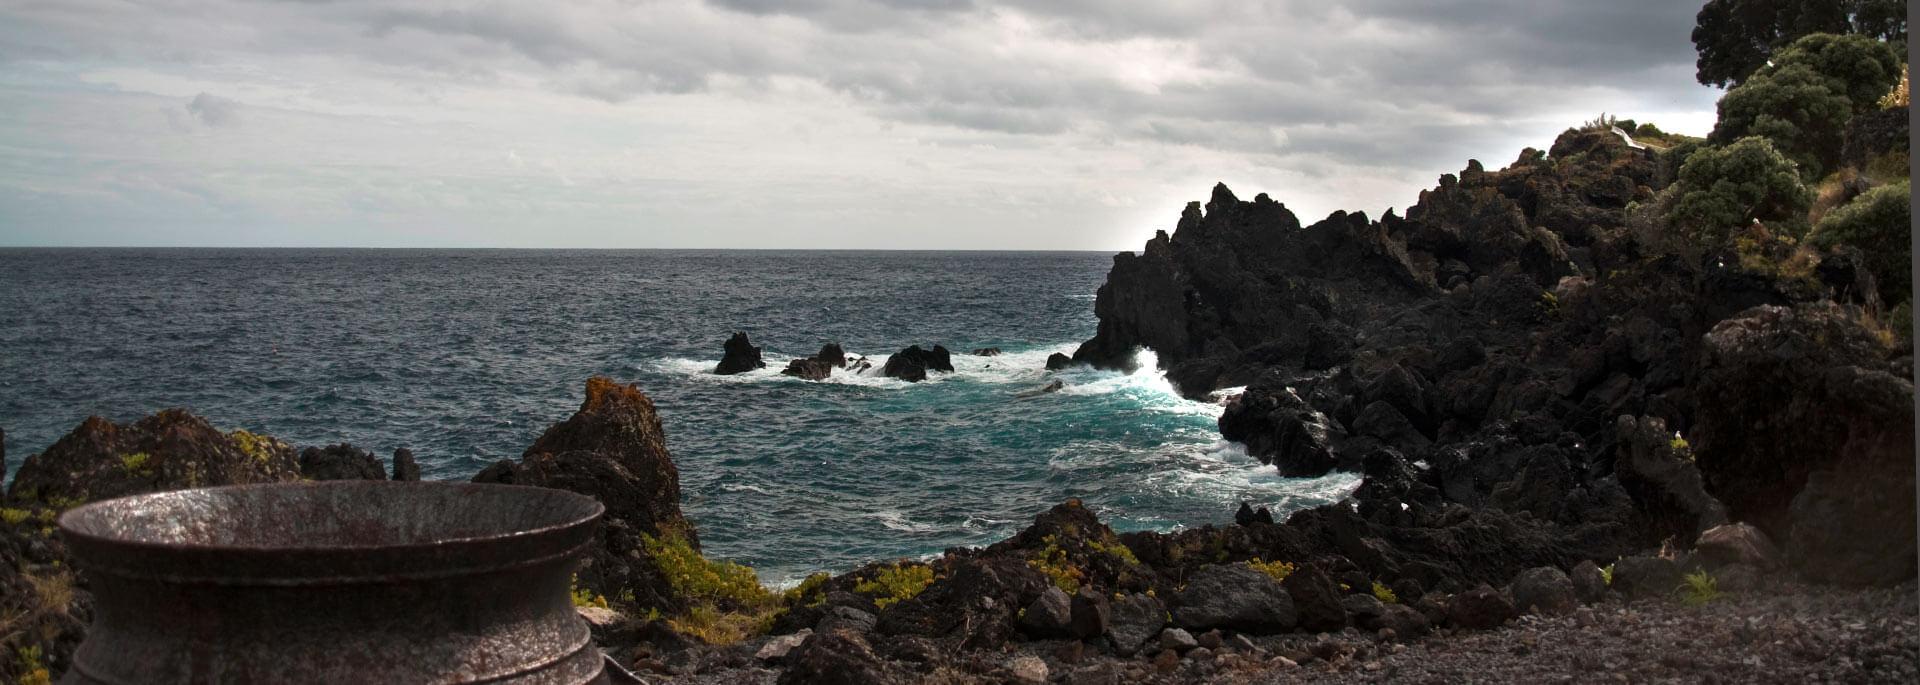 Fotos: Azoren-Insel Pico